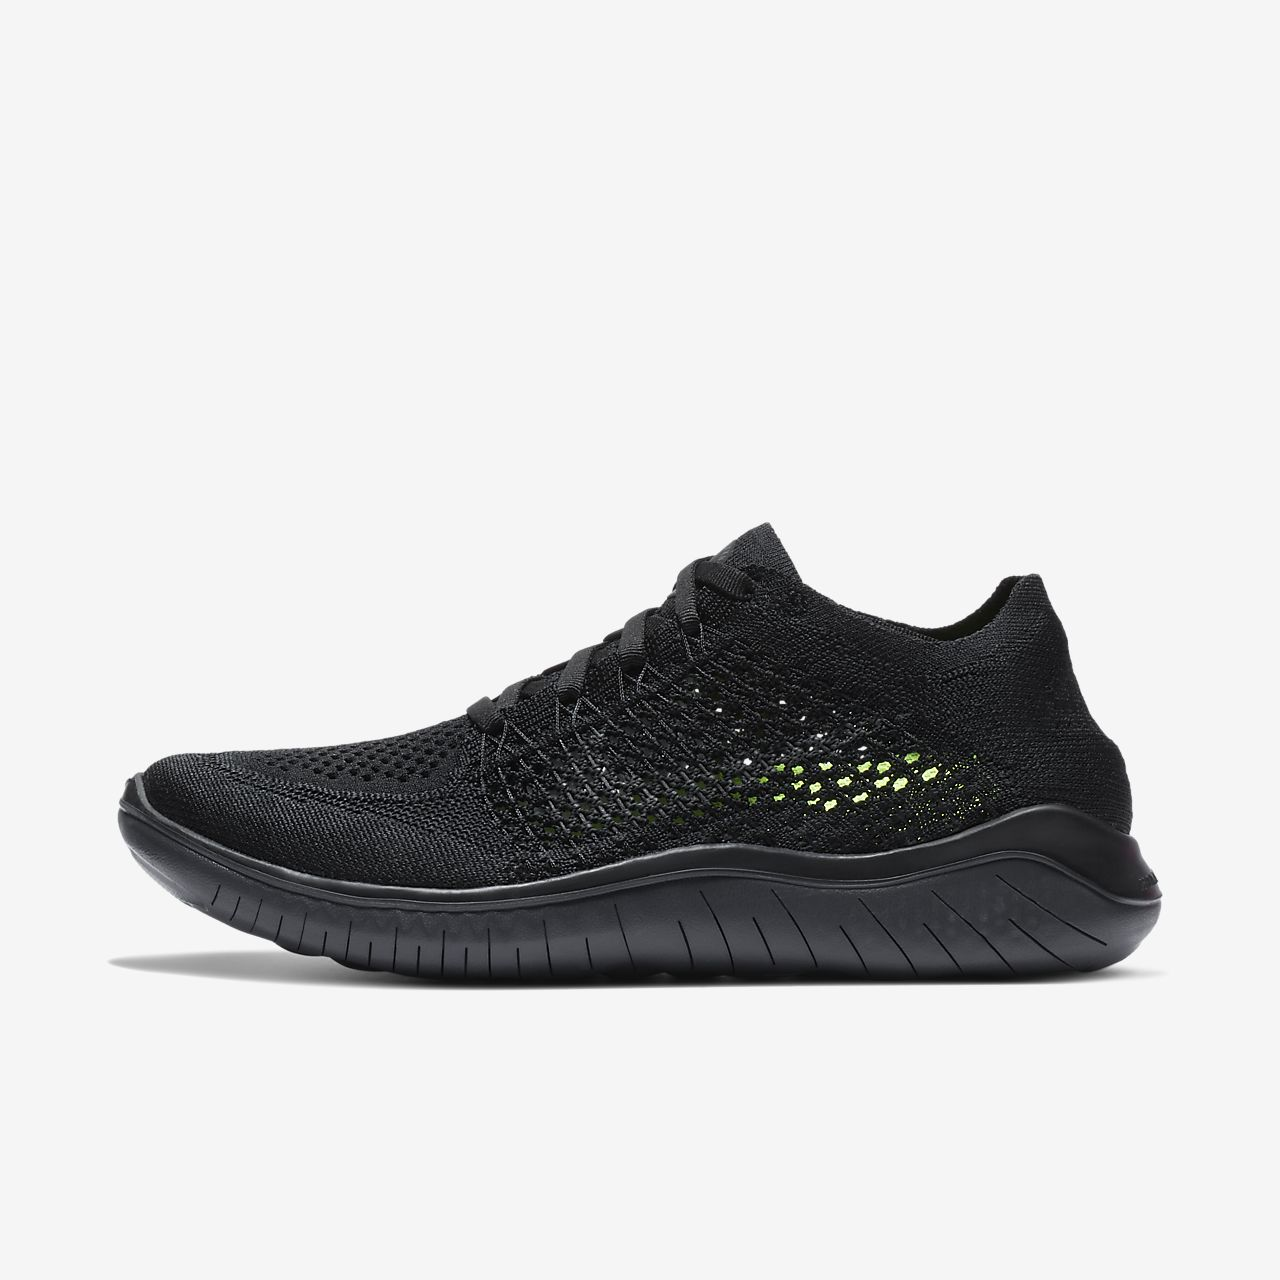 new concept f2672 1f875 ... Calzado de running para mujer Nike Free RN Flyknit 2018